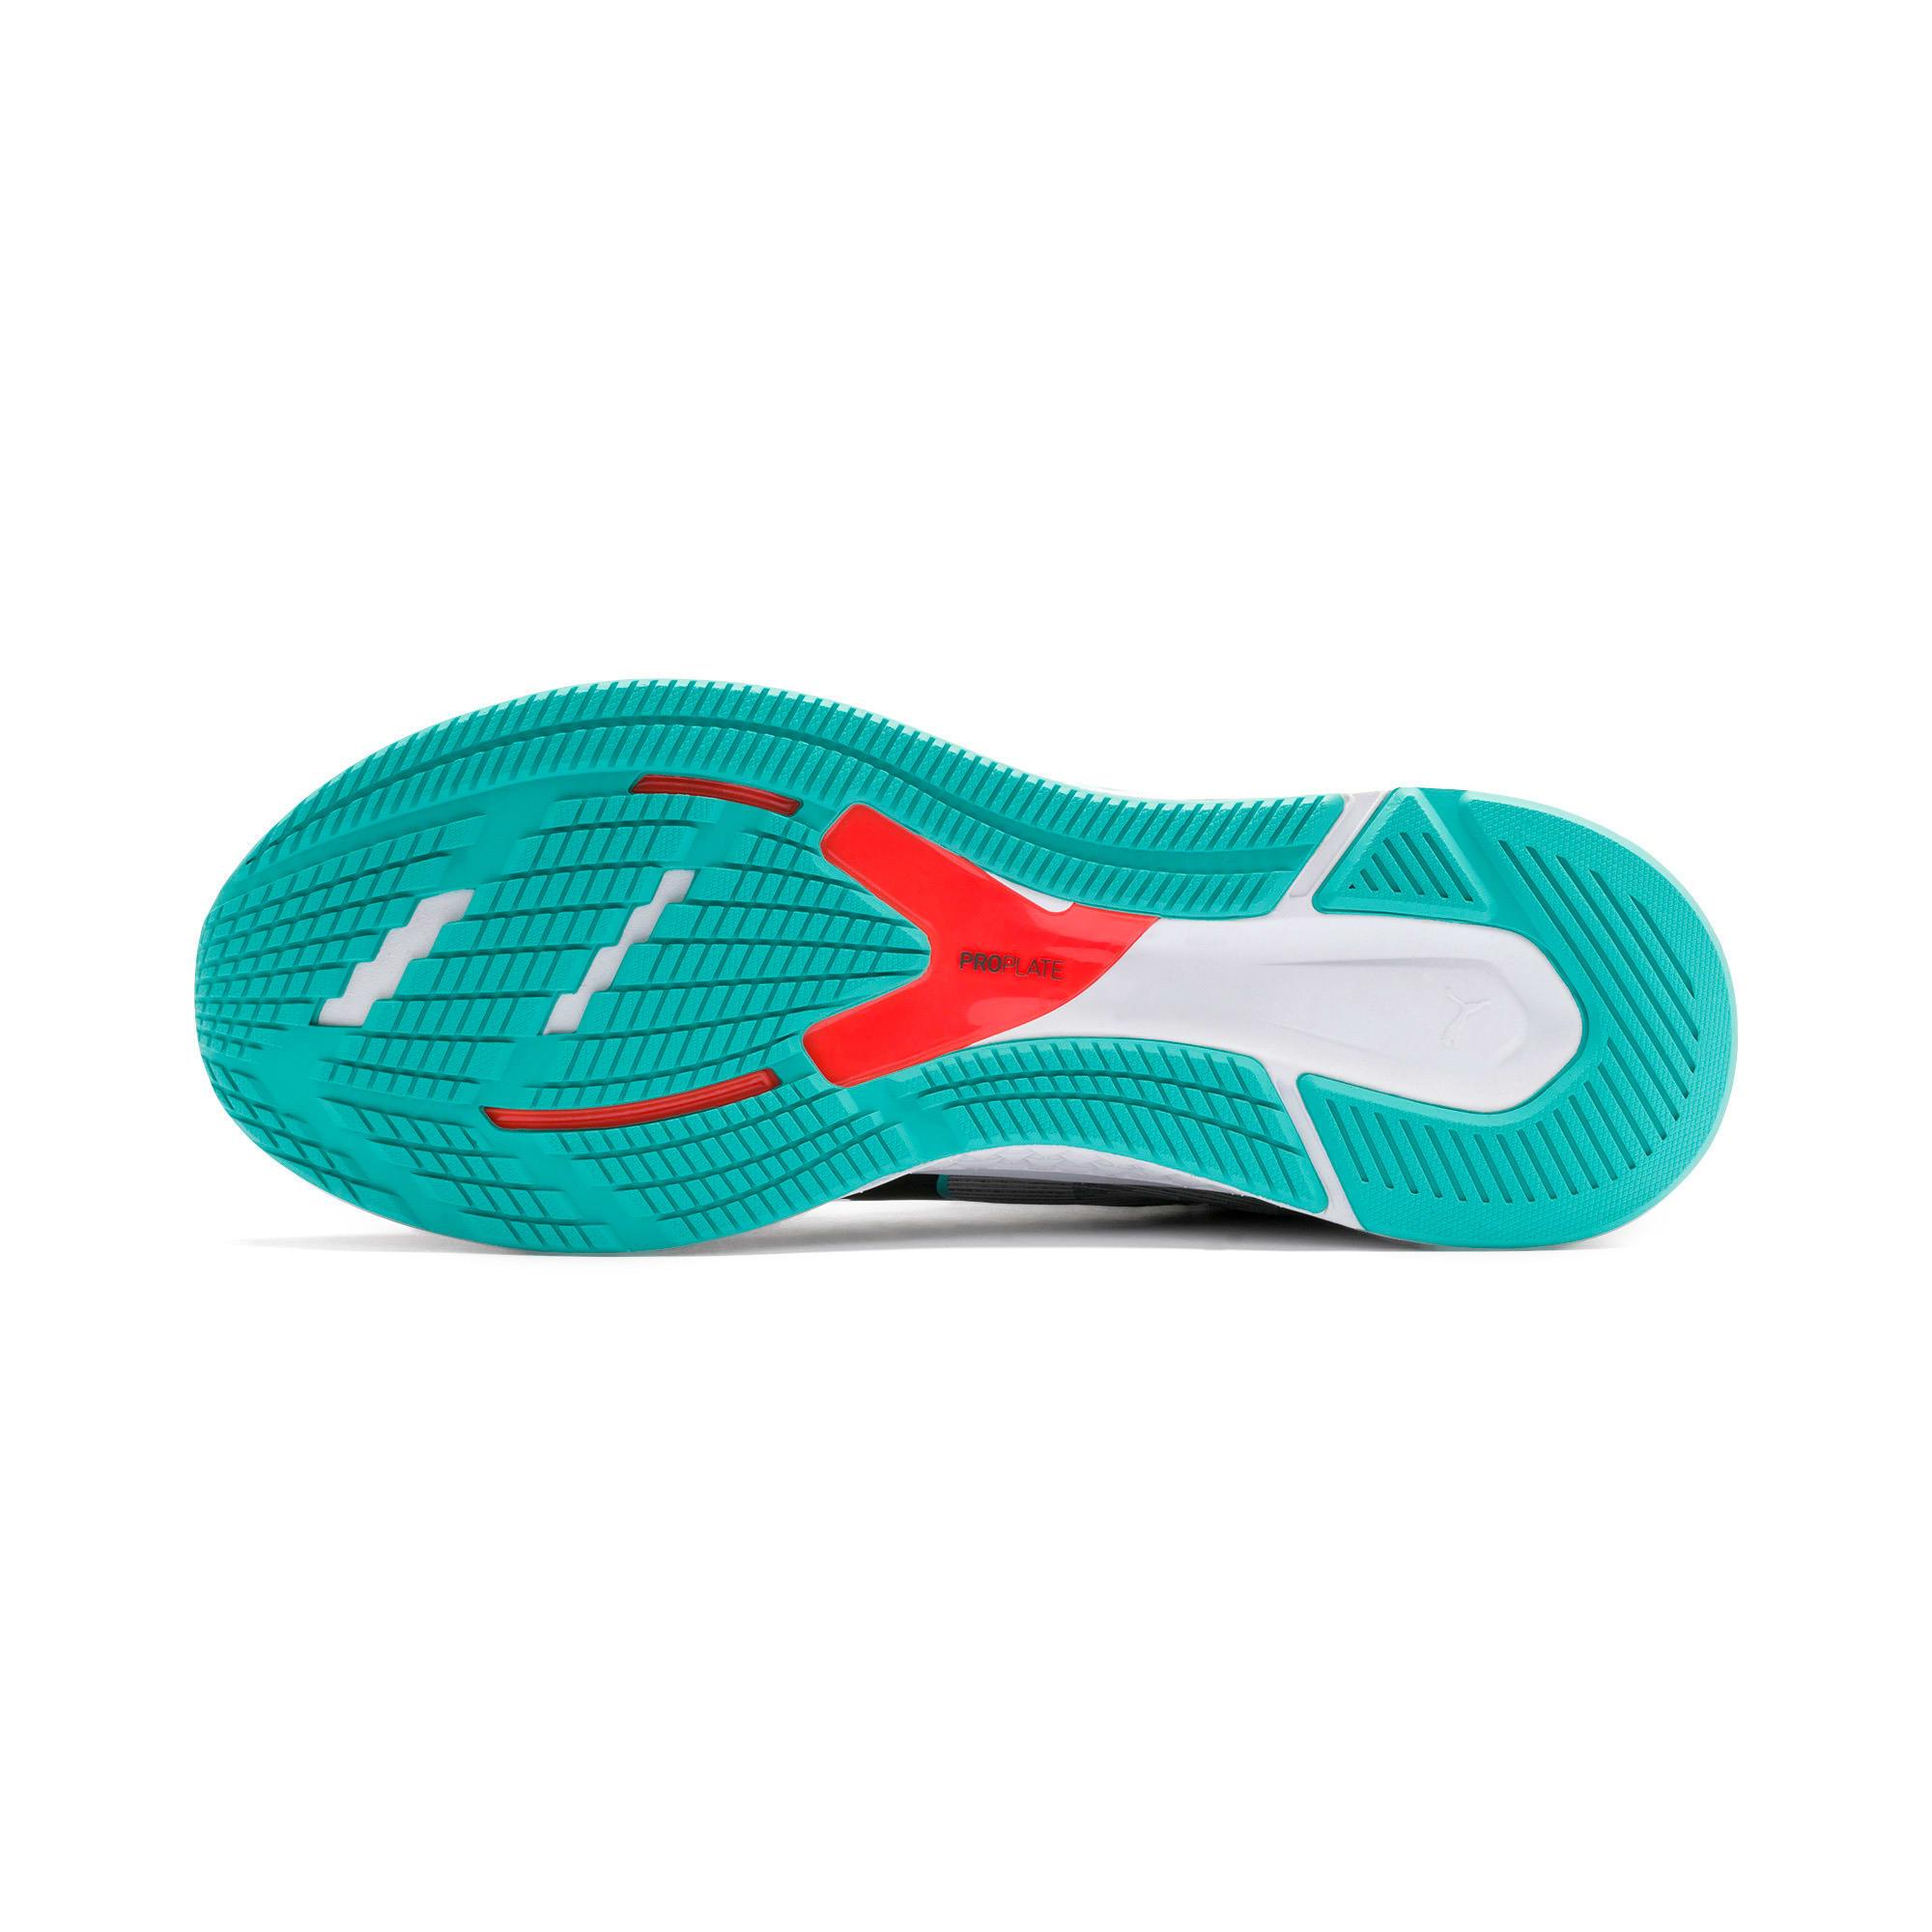 Thumbnail 6 of SPEED SUTAMINA Running Shoes, High Rise-Nrgy Red-Blue Turq, medium-IND